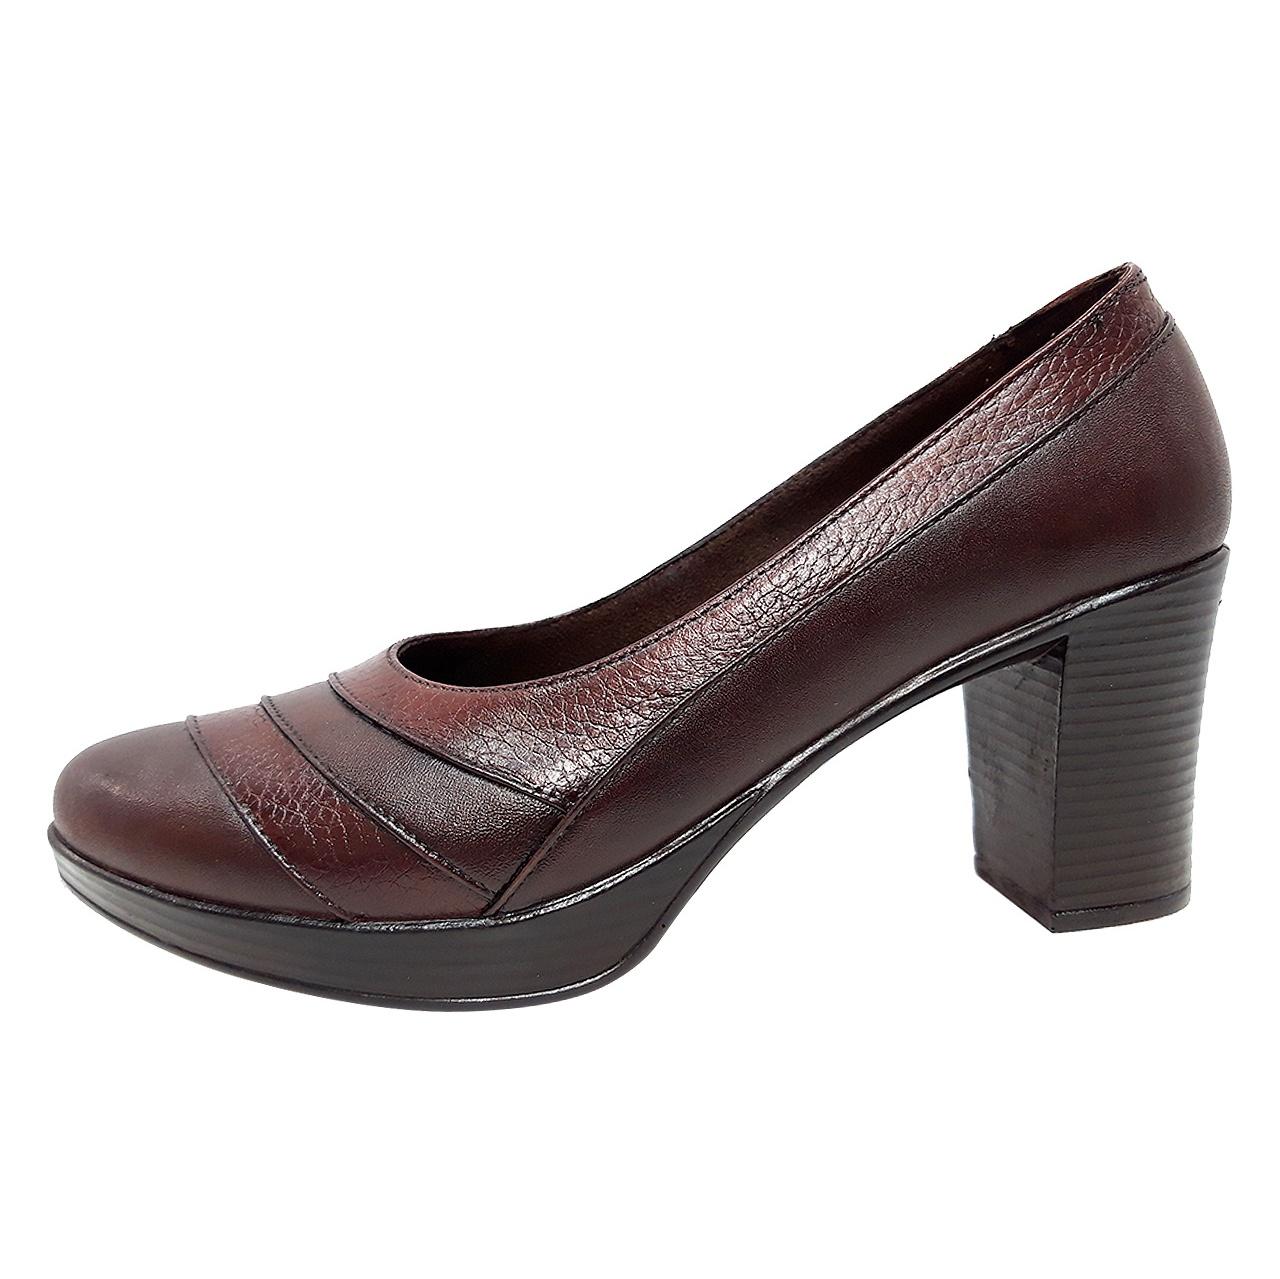 خرید                      کفش زنانه روشن کد 7050 کد 02